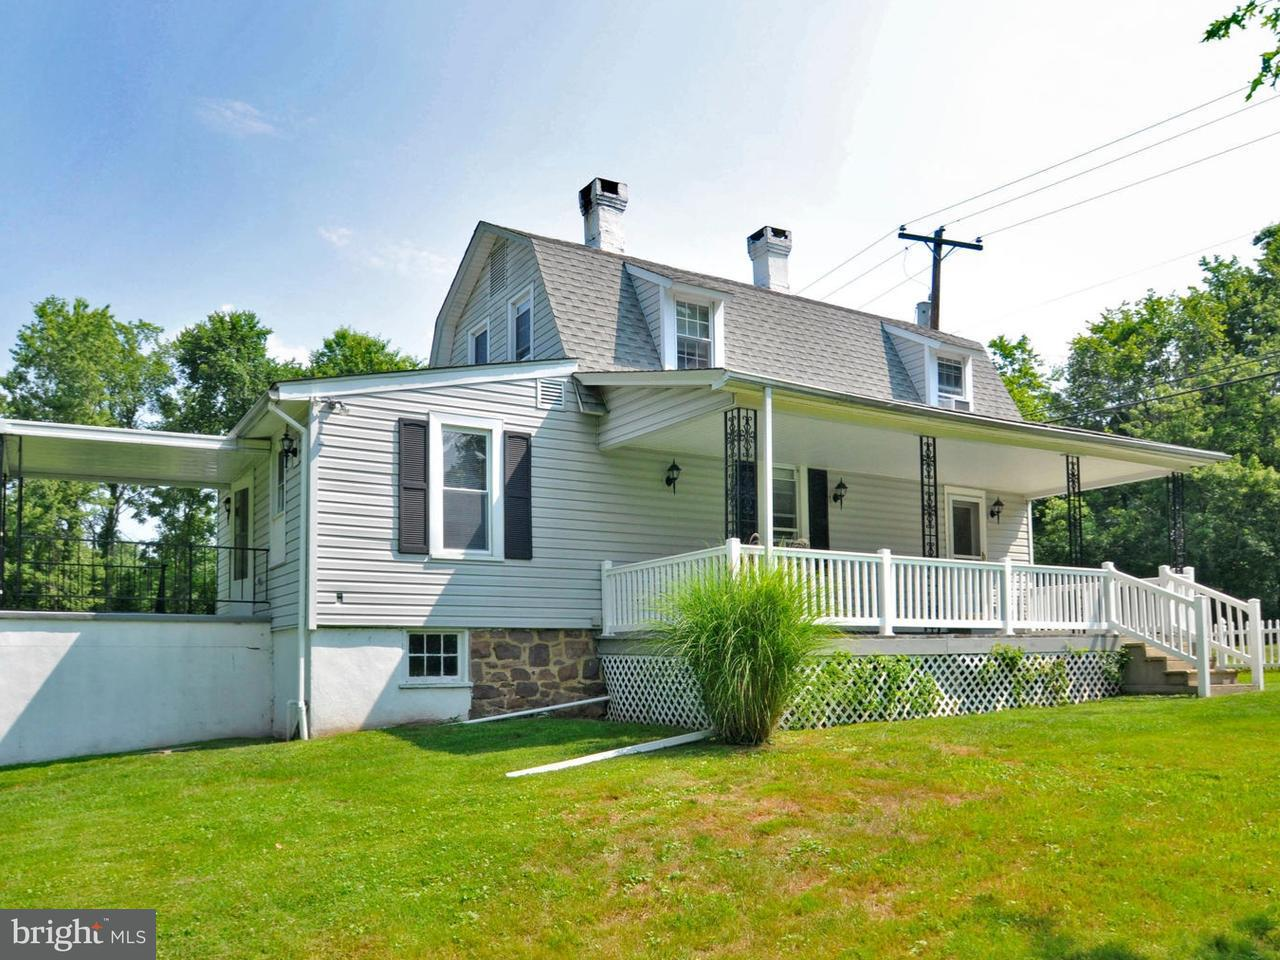 Single Family Home for Rent at 941 LIMEKILN PIKE Horsham, Pennsylvania 19002 United States